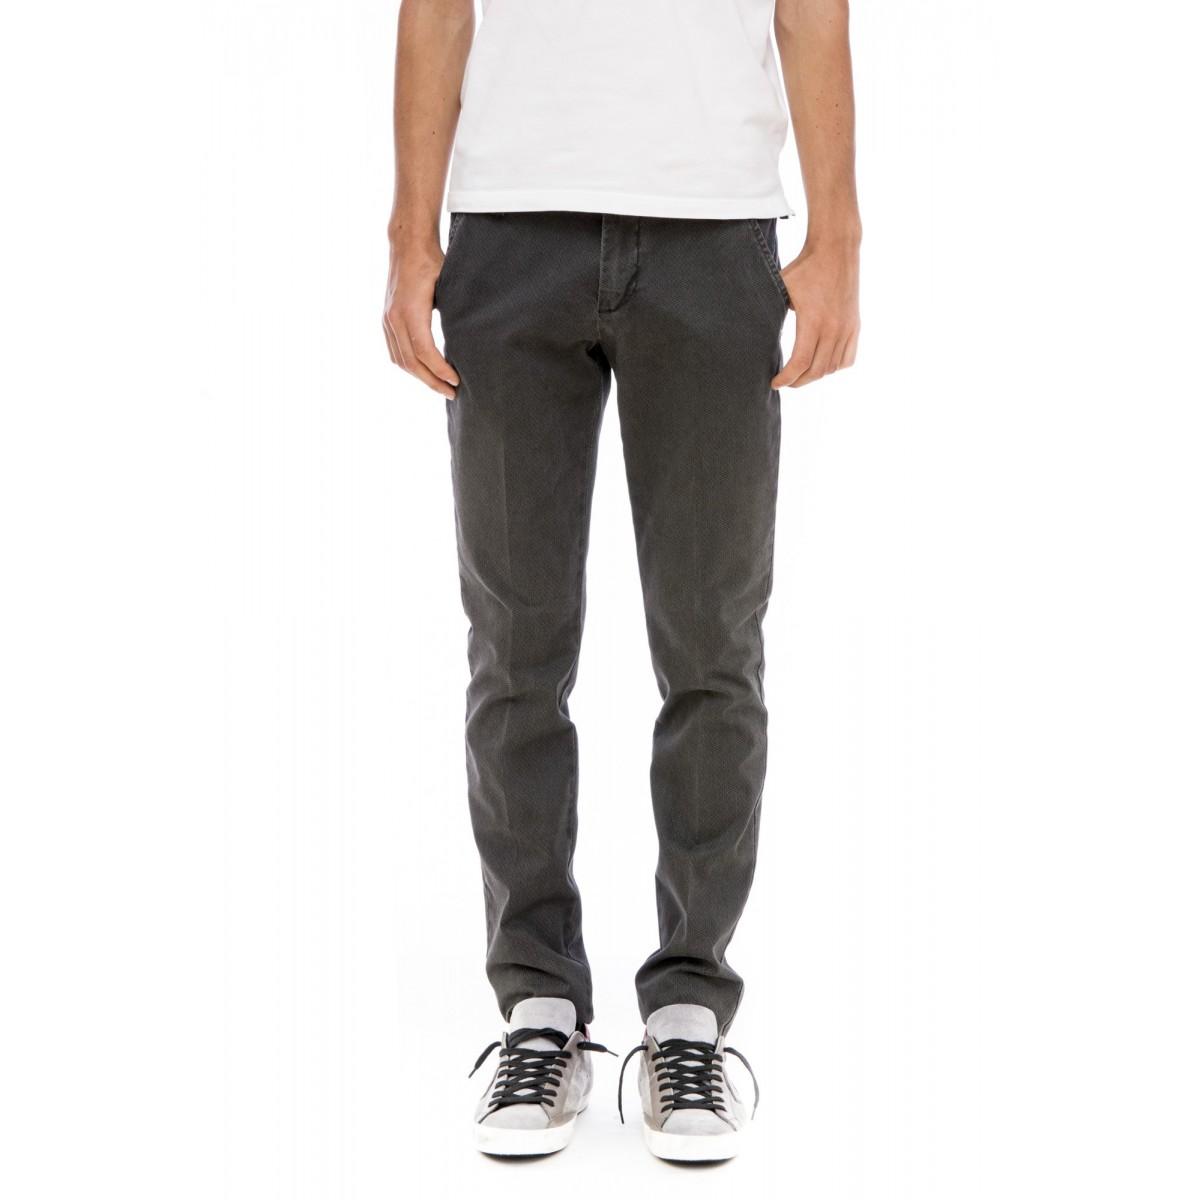 Pantalone uomo Entre amis - 8201/935 microfantasia strech